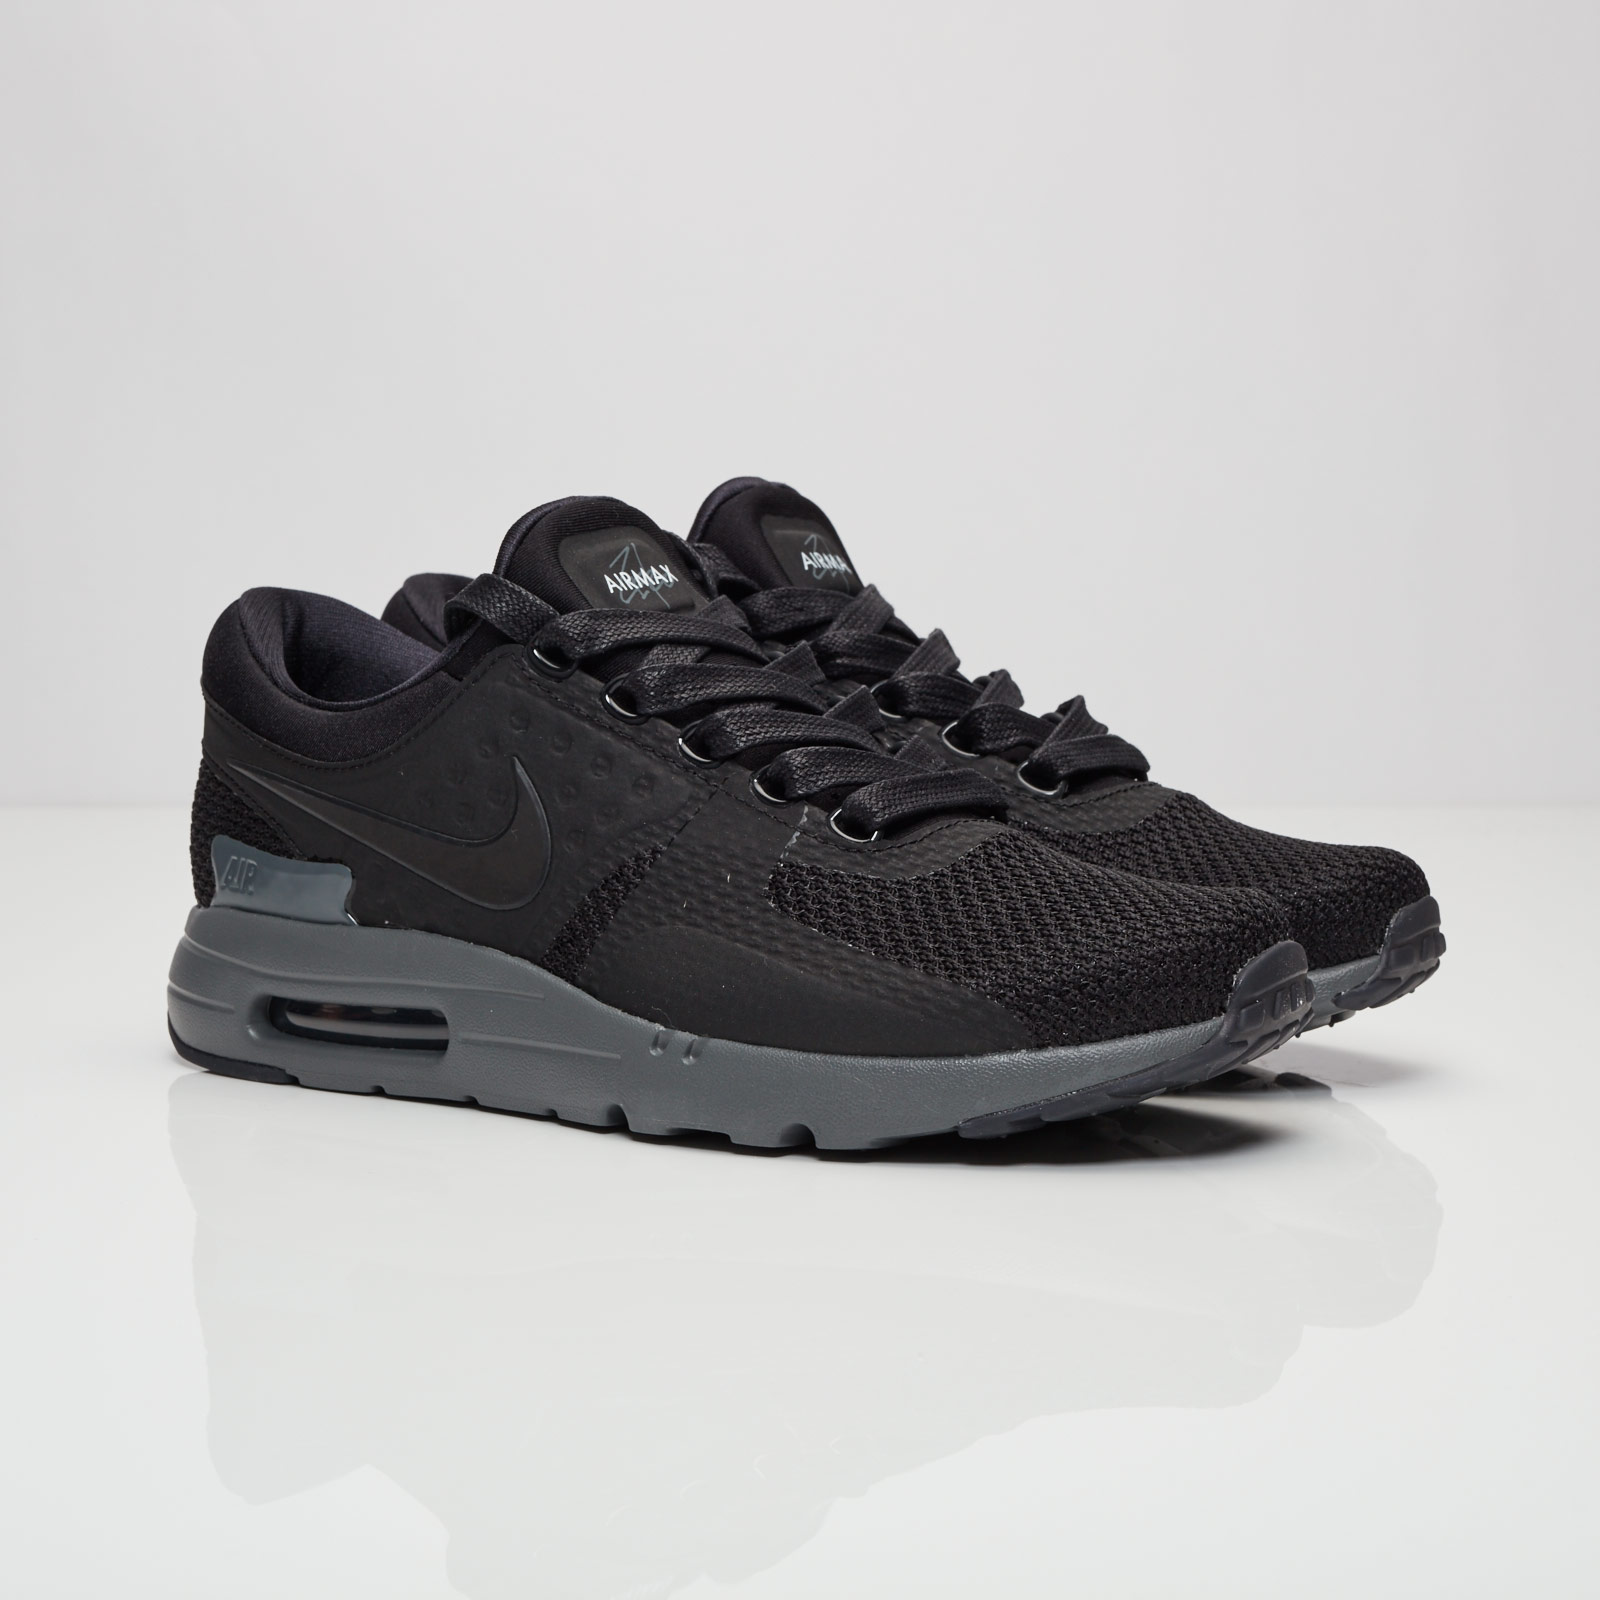 sale retailer a20cf 4dbaa Nike Air Max Zero QS - 789695-001 - Sneakersnstuff ...